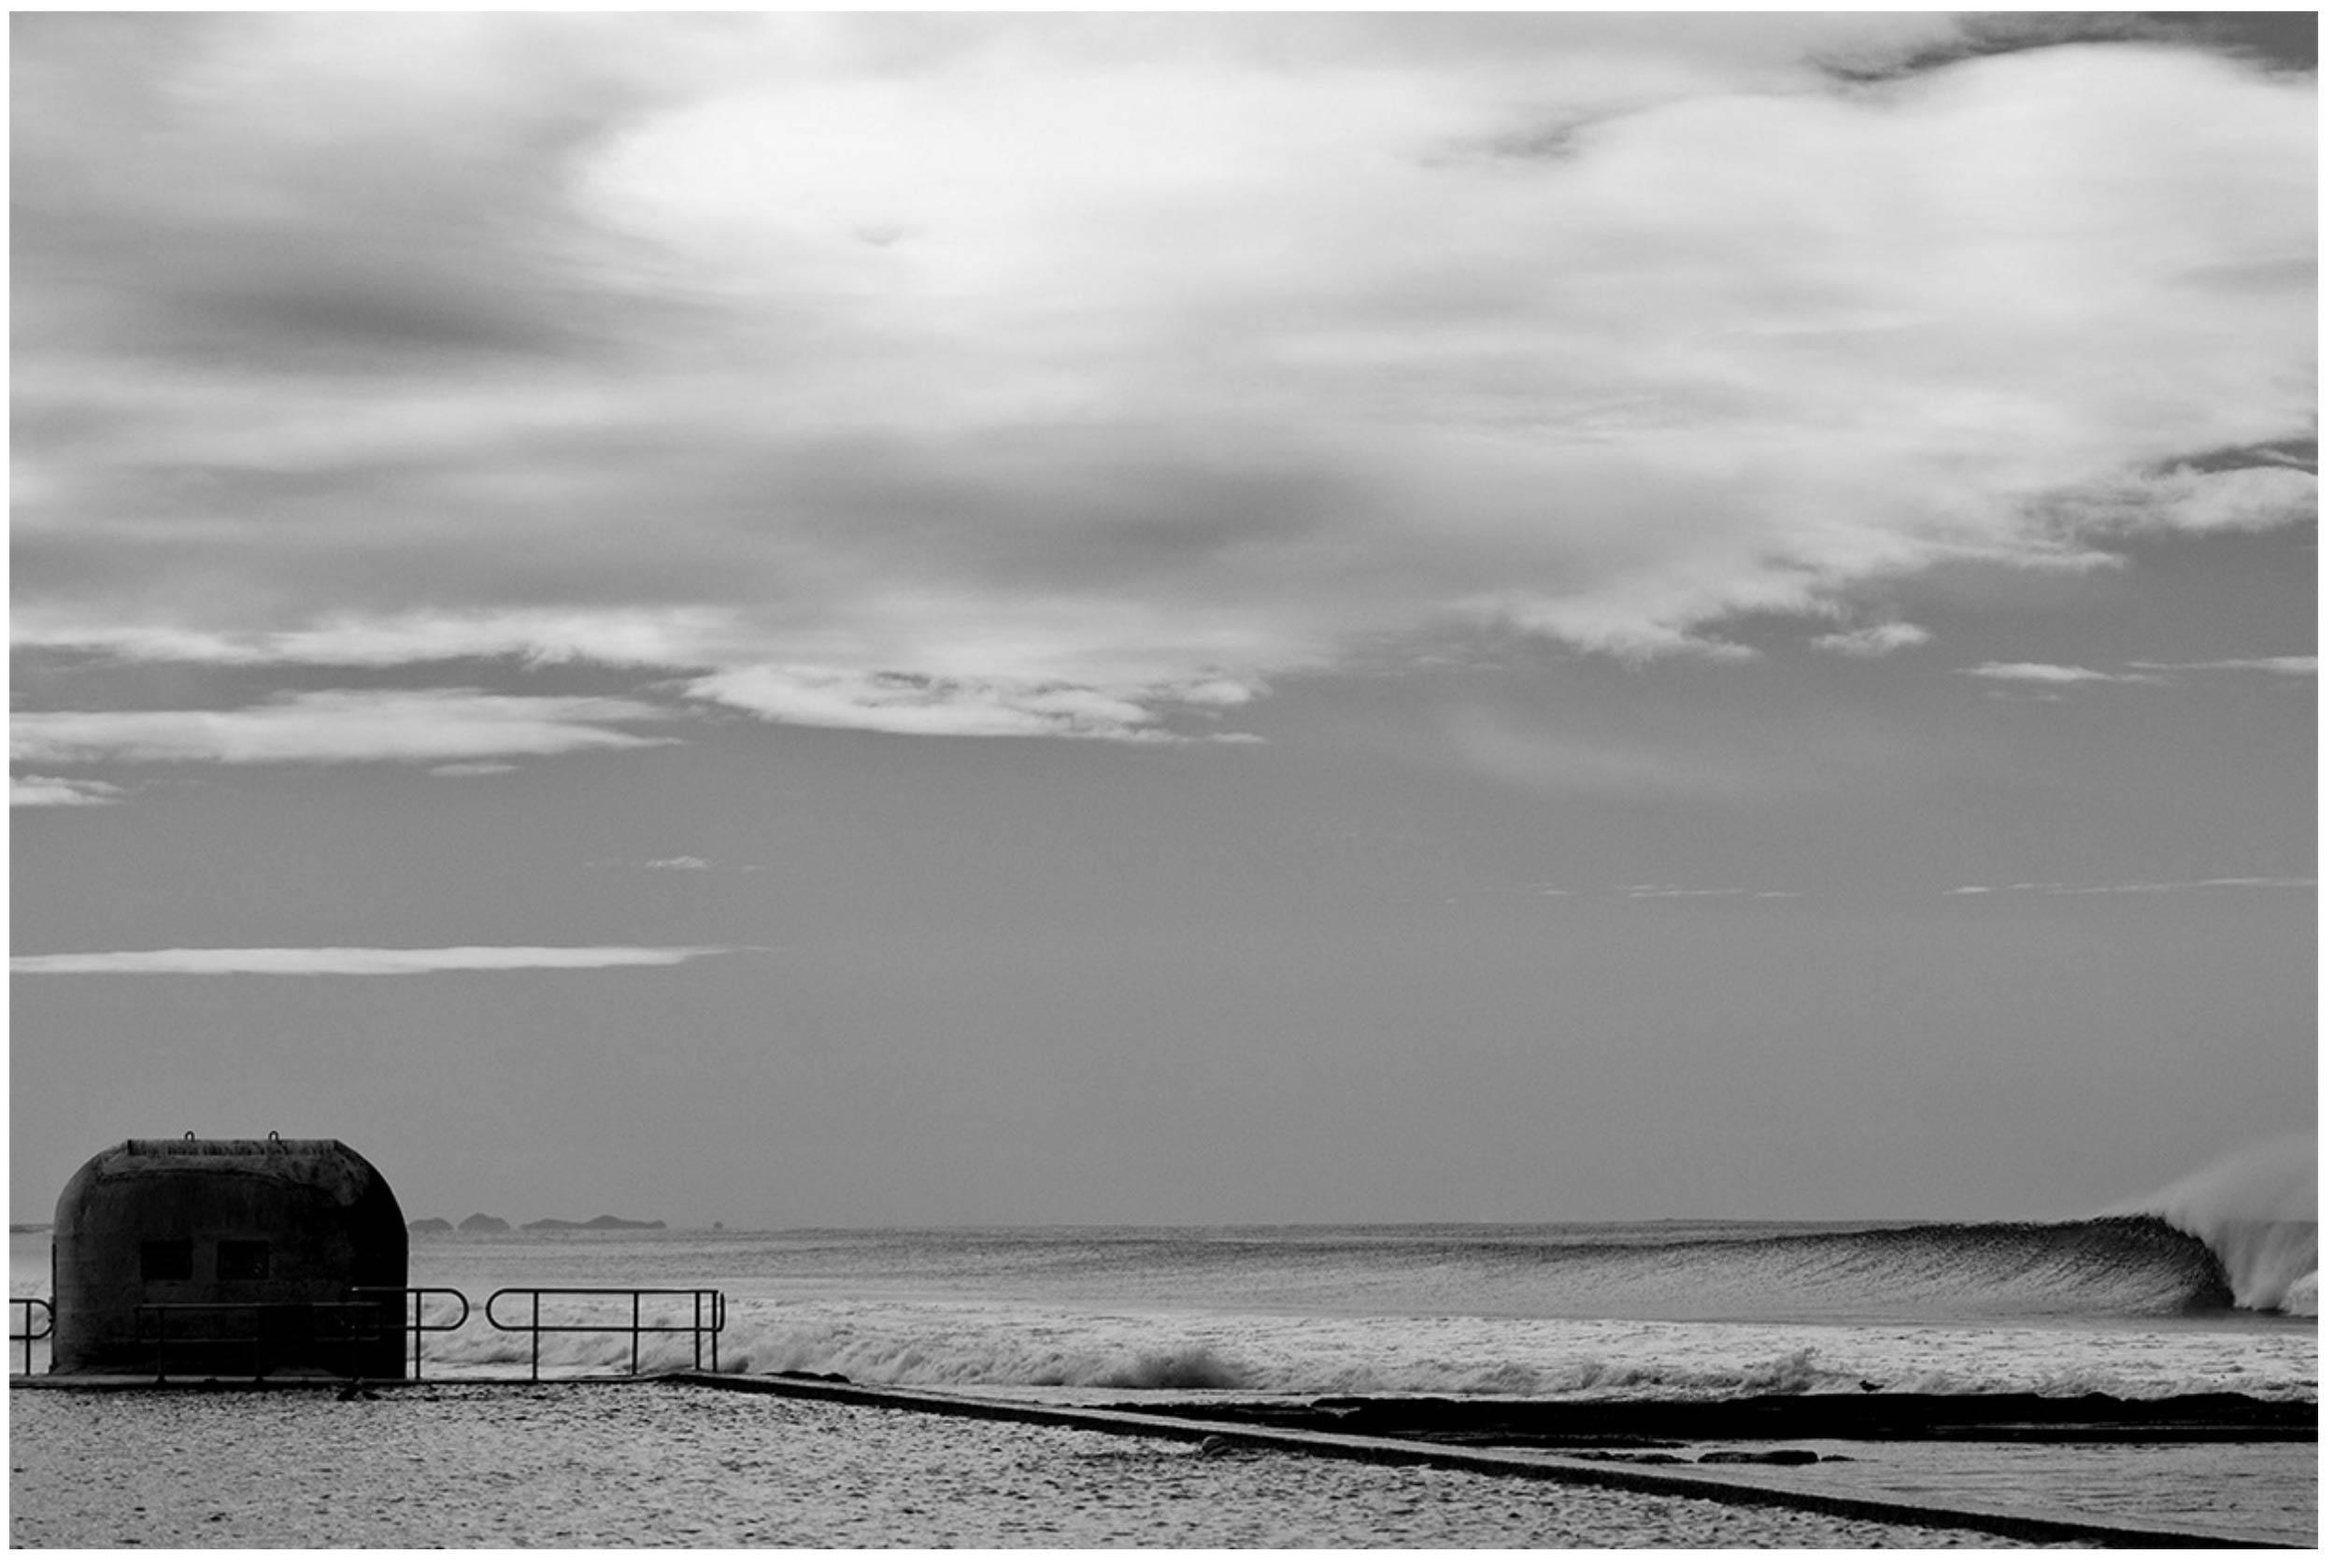 rodd-owen-ocean-surf-photography-for-sale-130.jpg